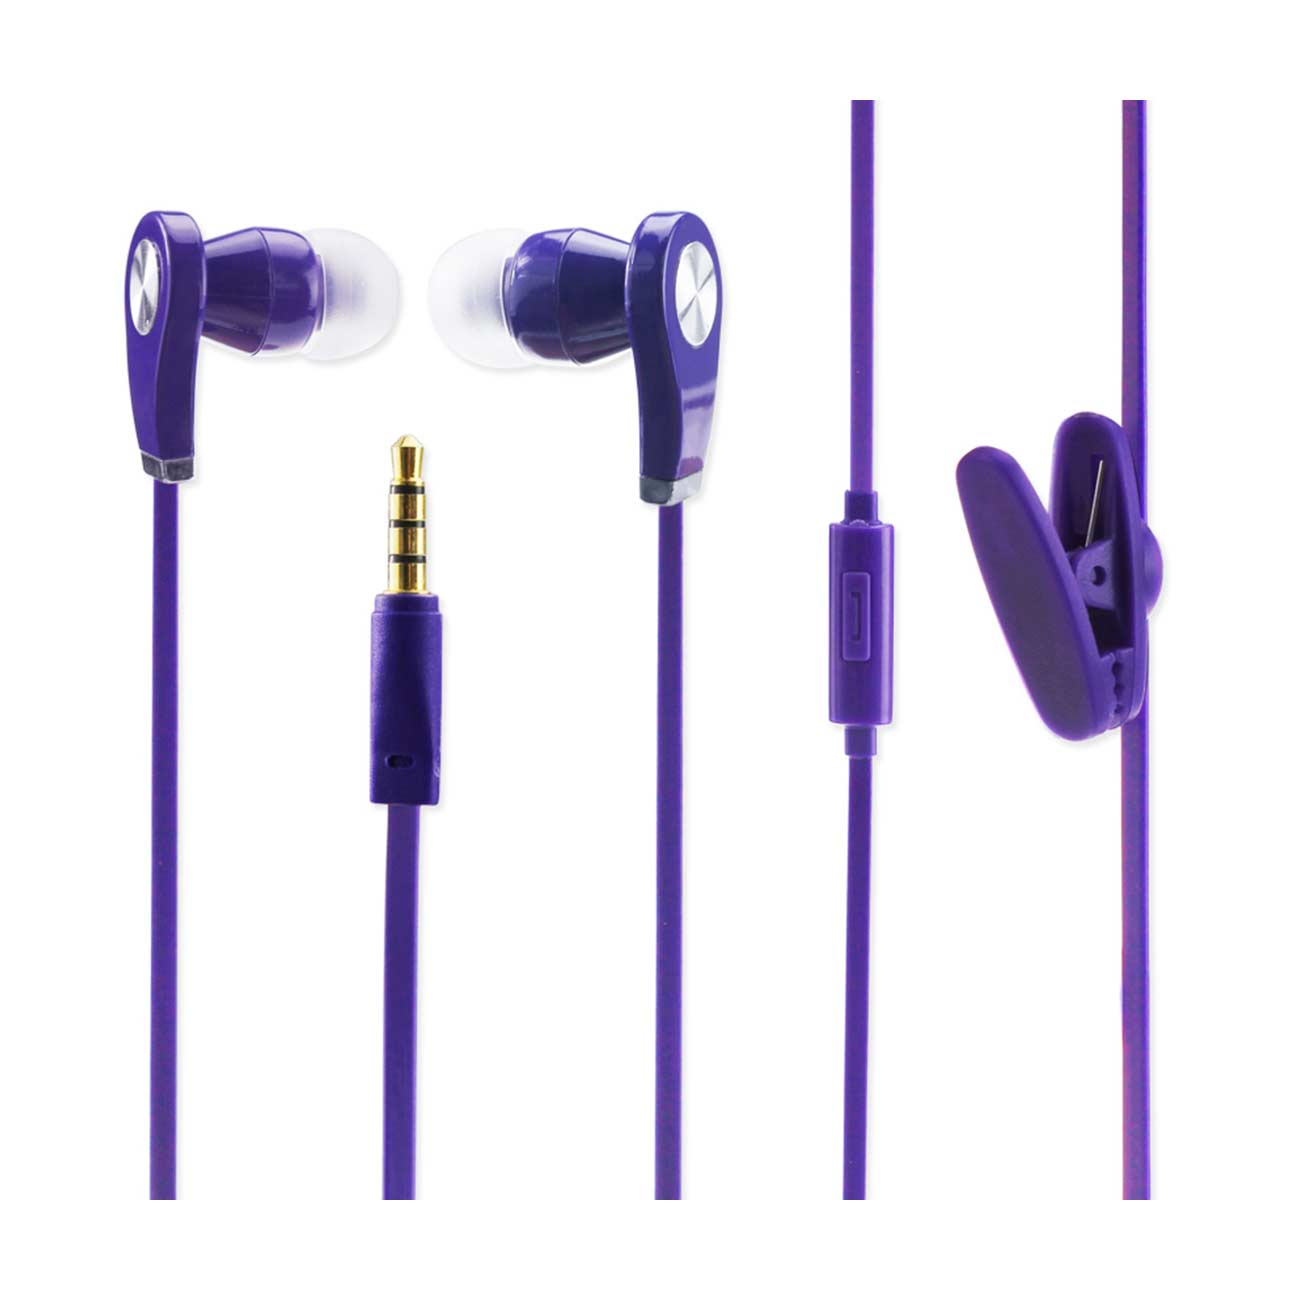 SHAKE PROOF EAR HEADPHONES WITH MIC